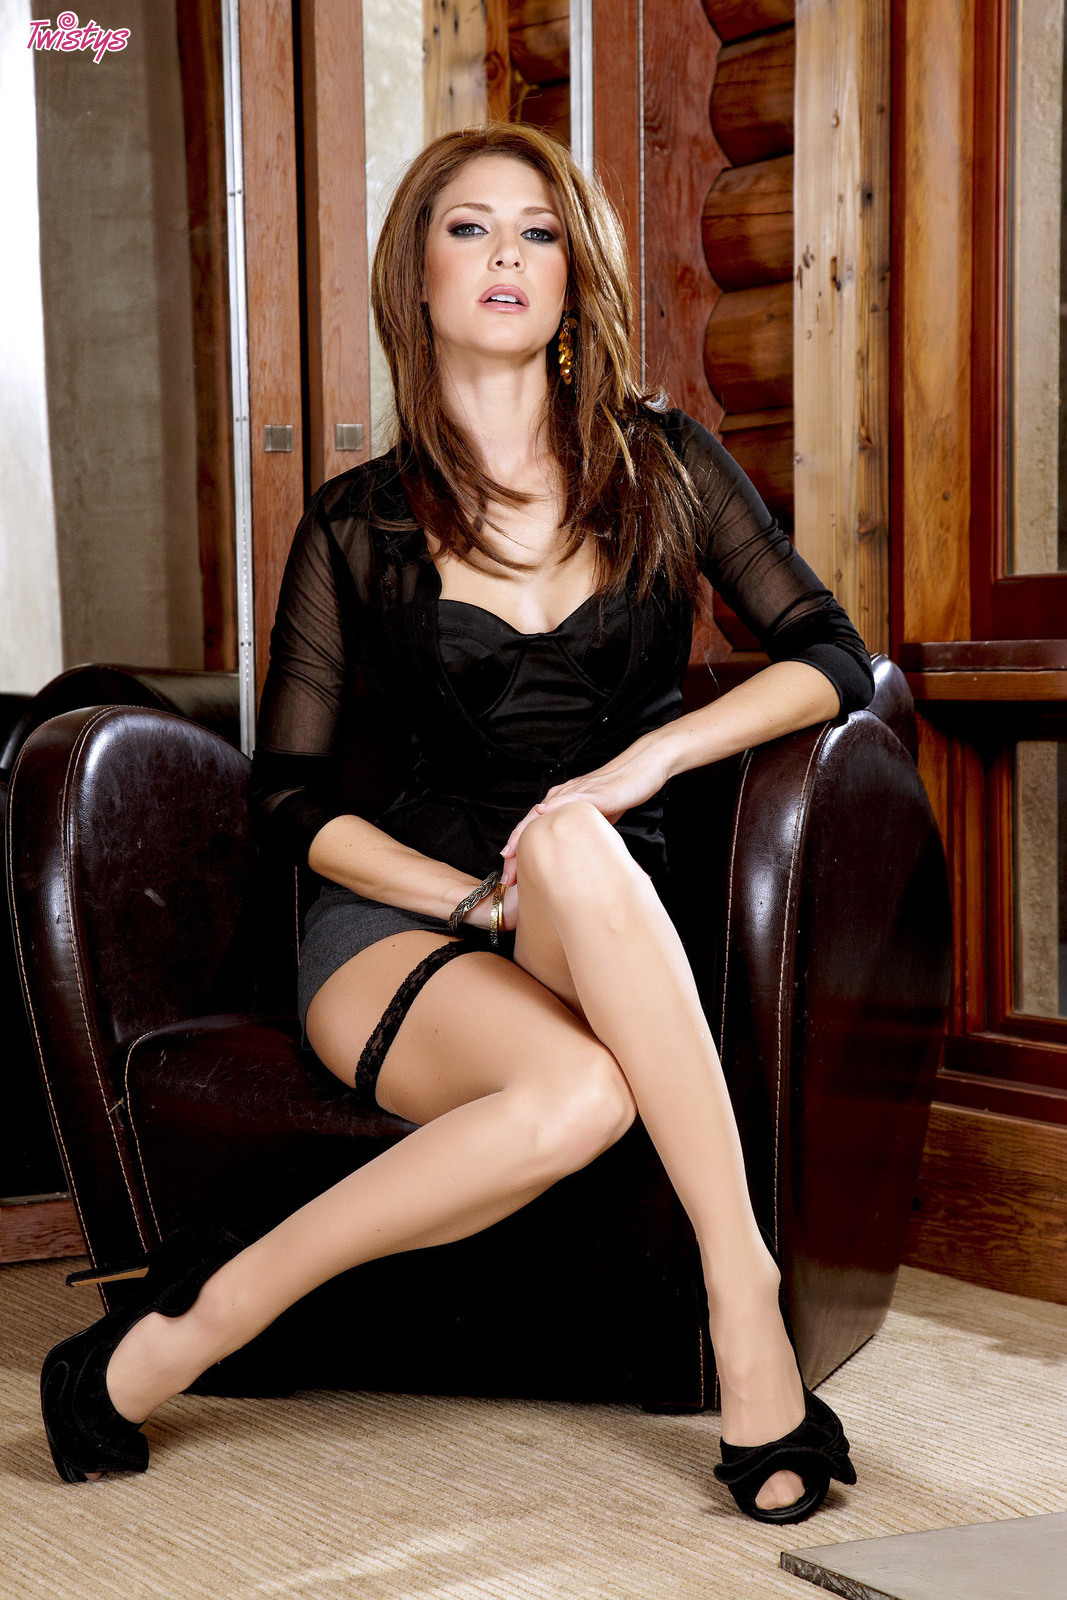 Lee stockings jenni